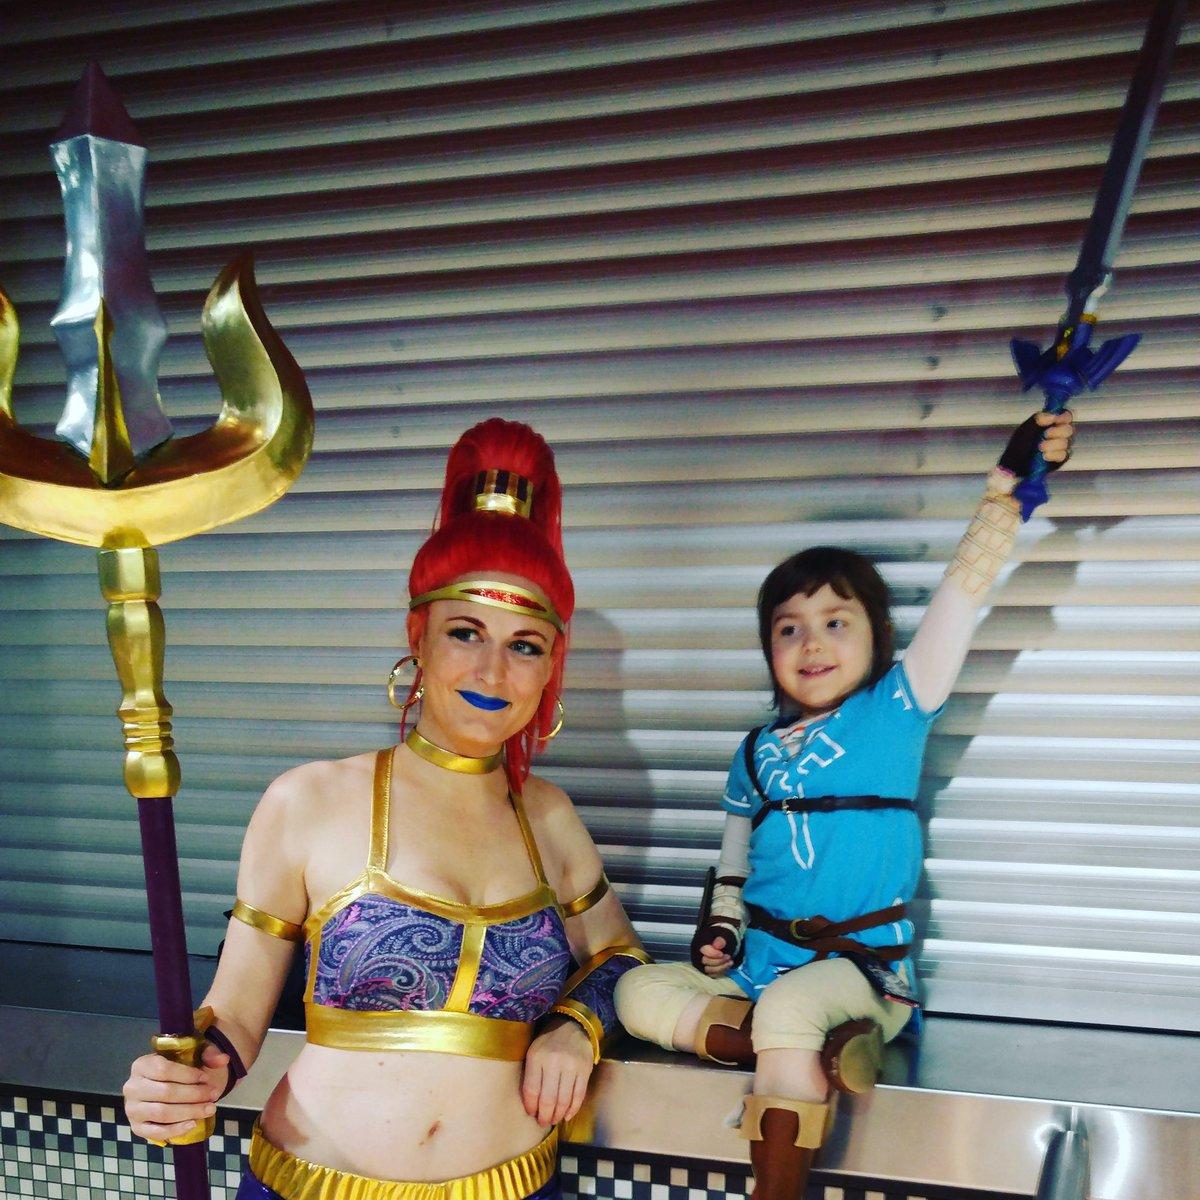 #acen2017 #kidcosplay #LoZ #Link #Callofthewild #LegendOfZelda So cuuute!<br>http://pic.twitter.com/sCHY5oegsN